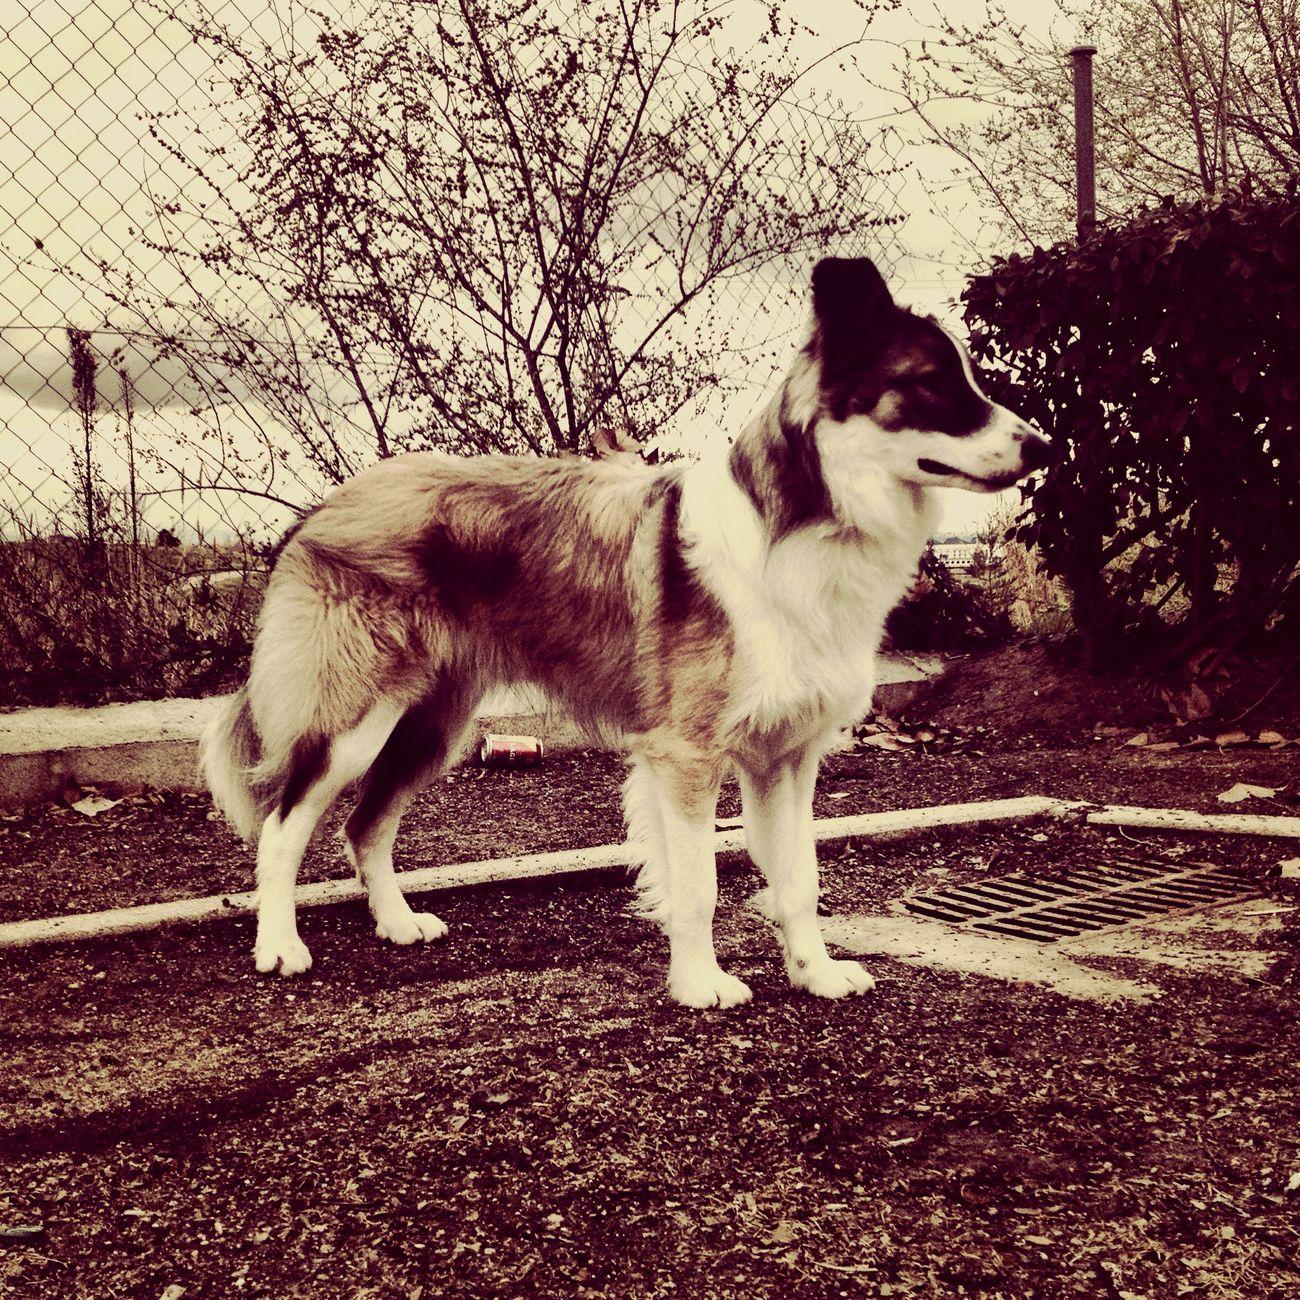 Border Collie Bordercollie  Pets Puppy Perros  Perromolon Mascotas Ilovemydog IloveIT ♡